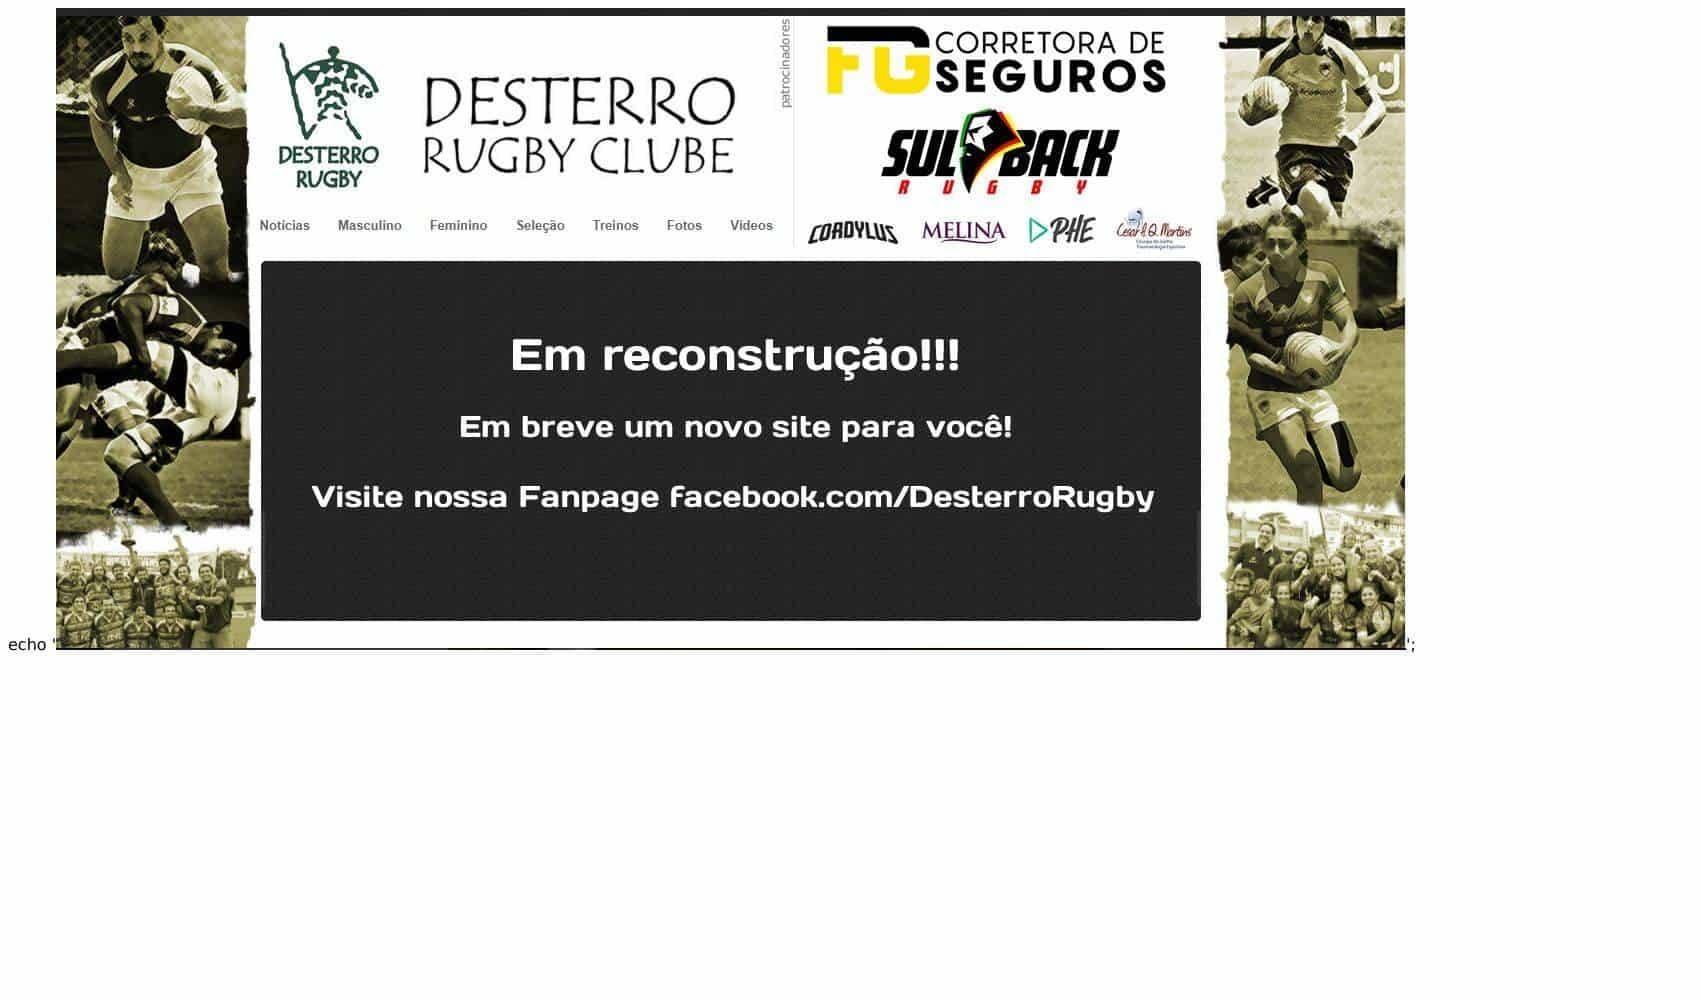 Desterro Rugby Clube